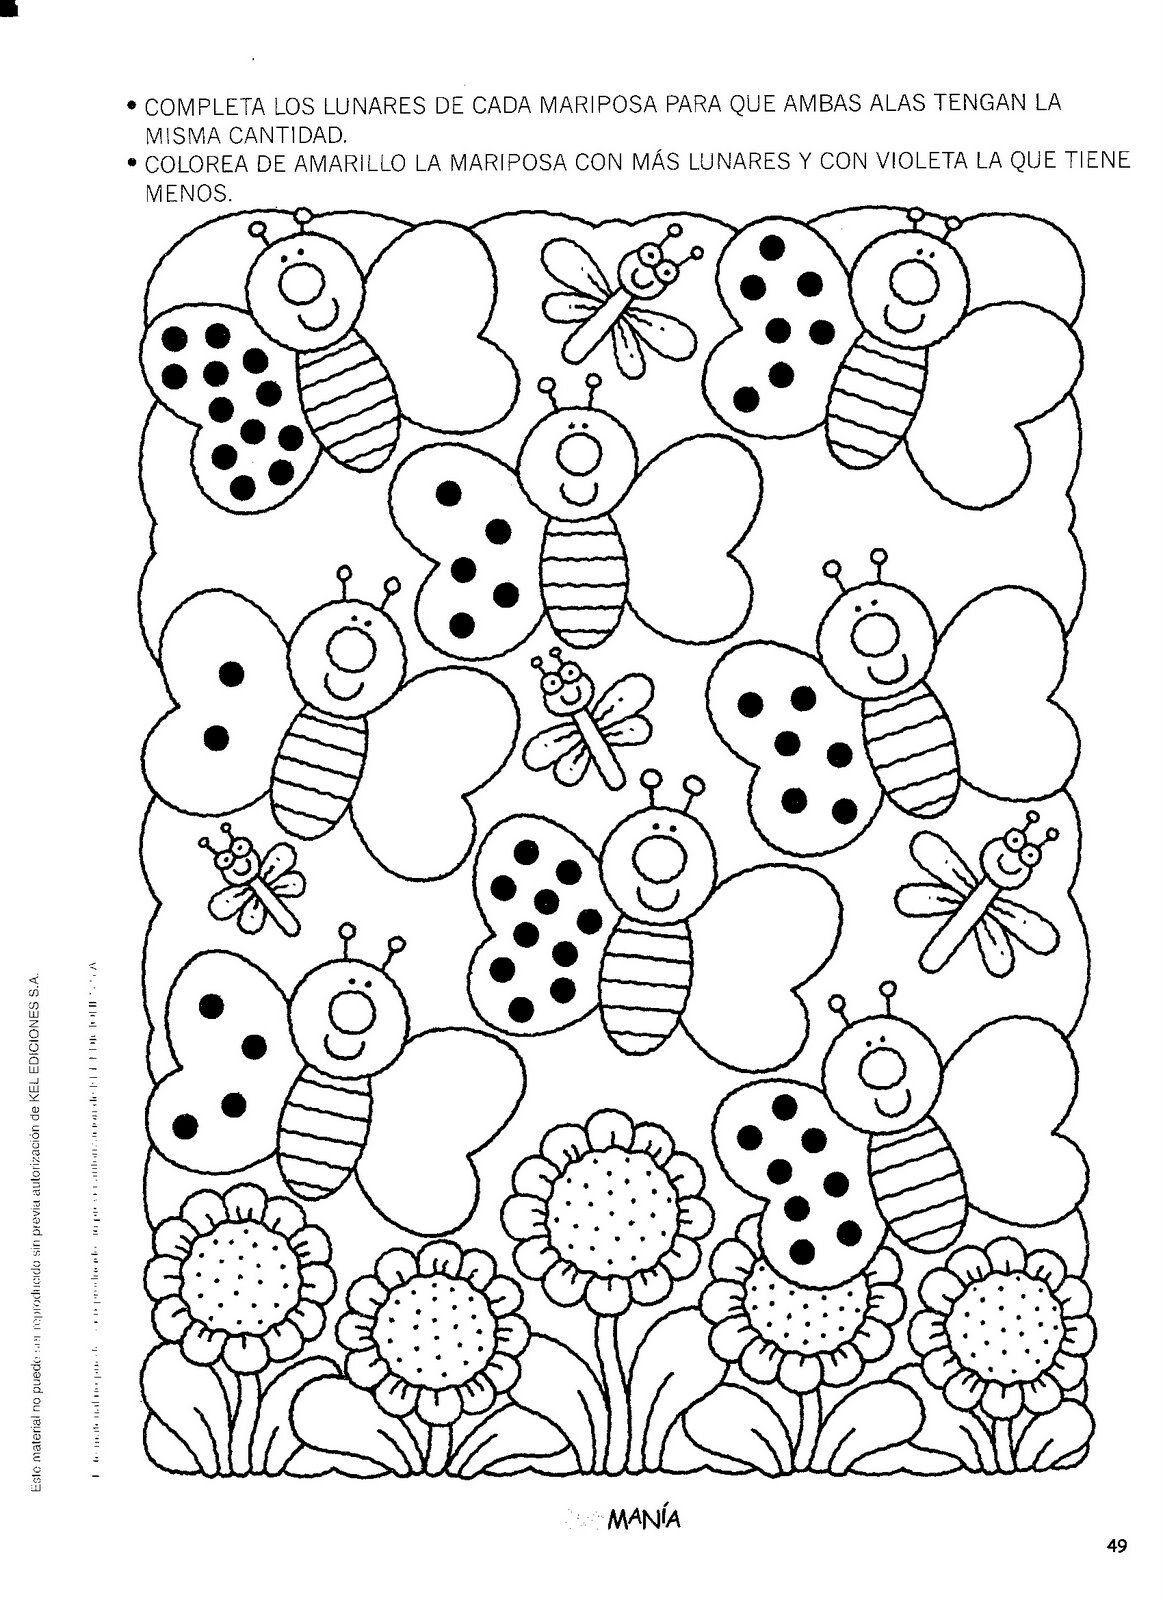 Pin von monica macias auf numeromania   Pinterest